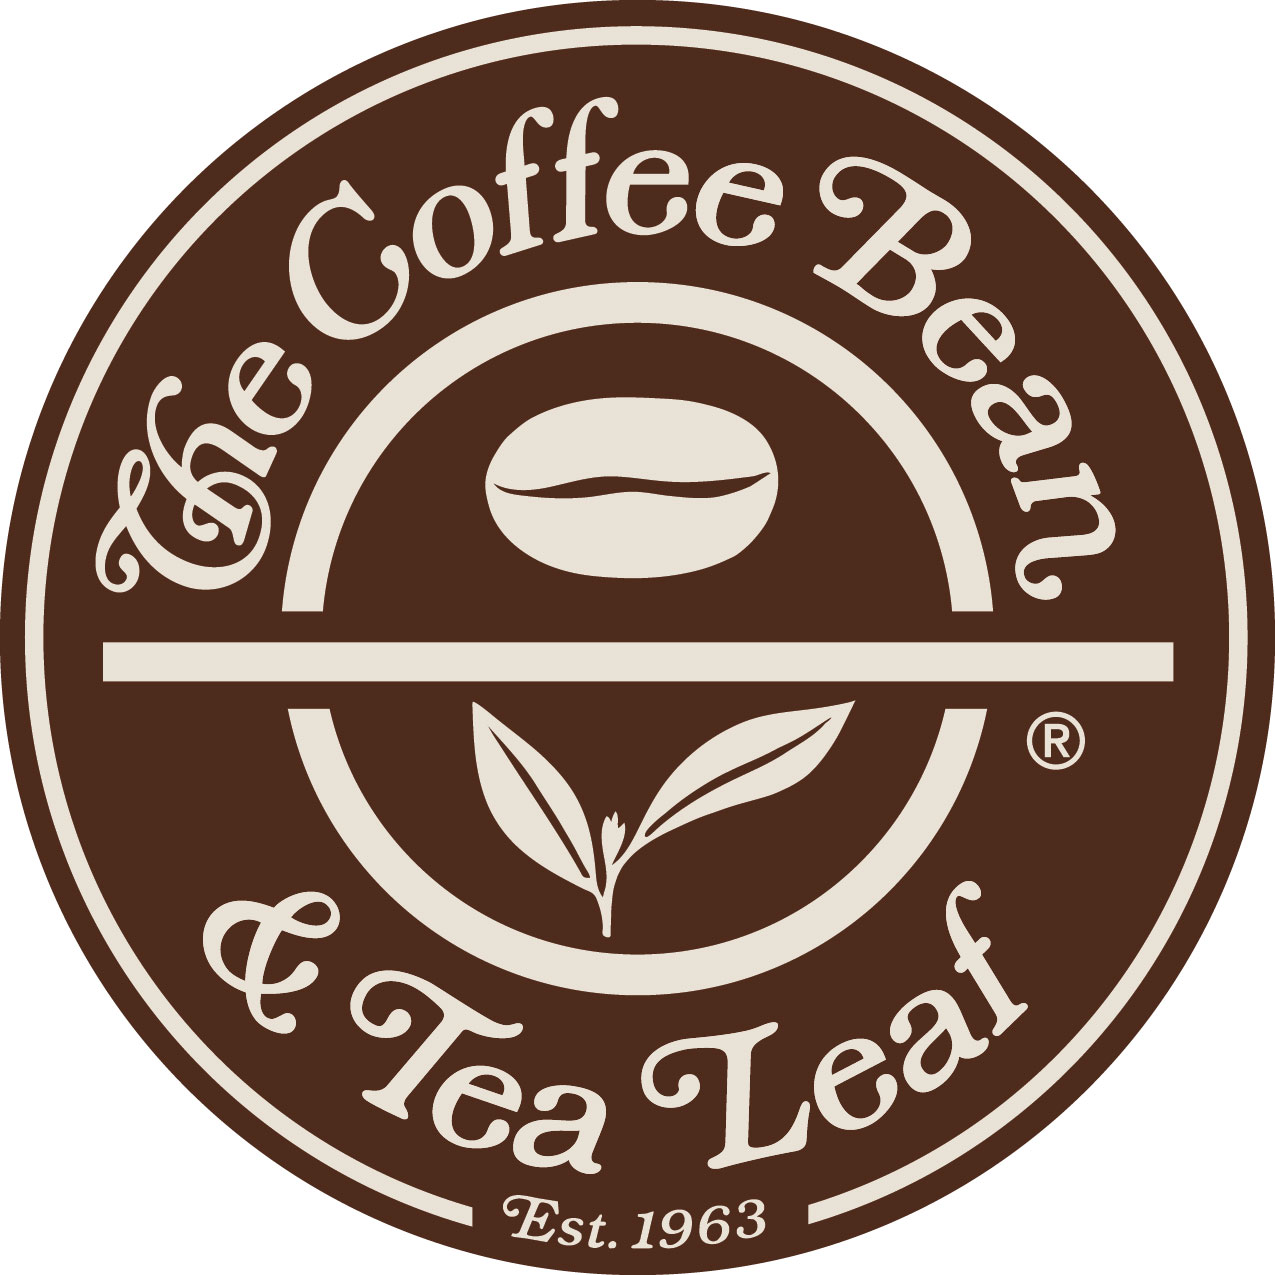 The Coffee Bean & Tea Leaf ® (CBTL) Logo copy